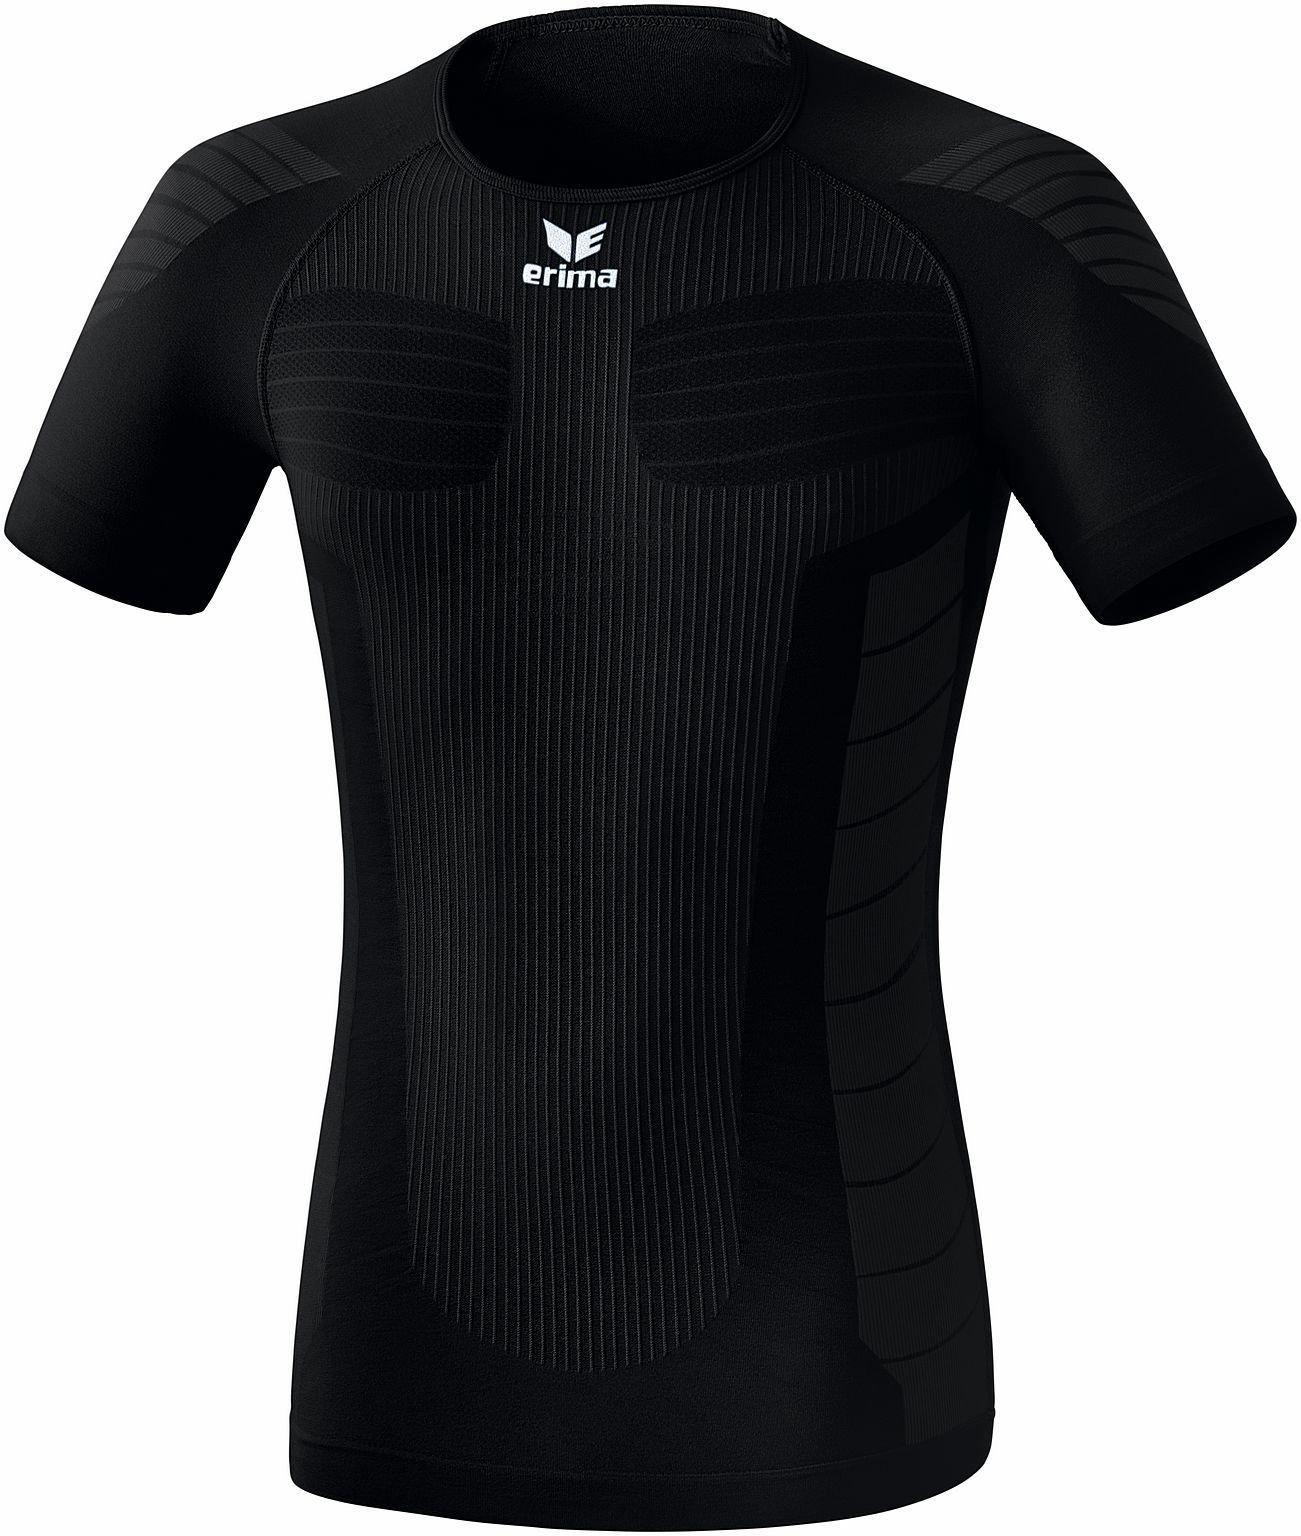 Funktion T-Shirt